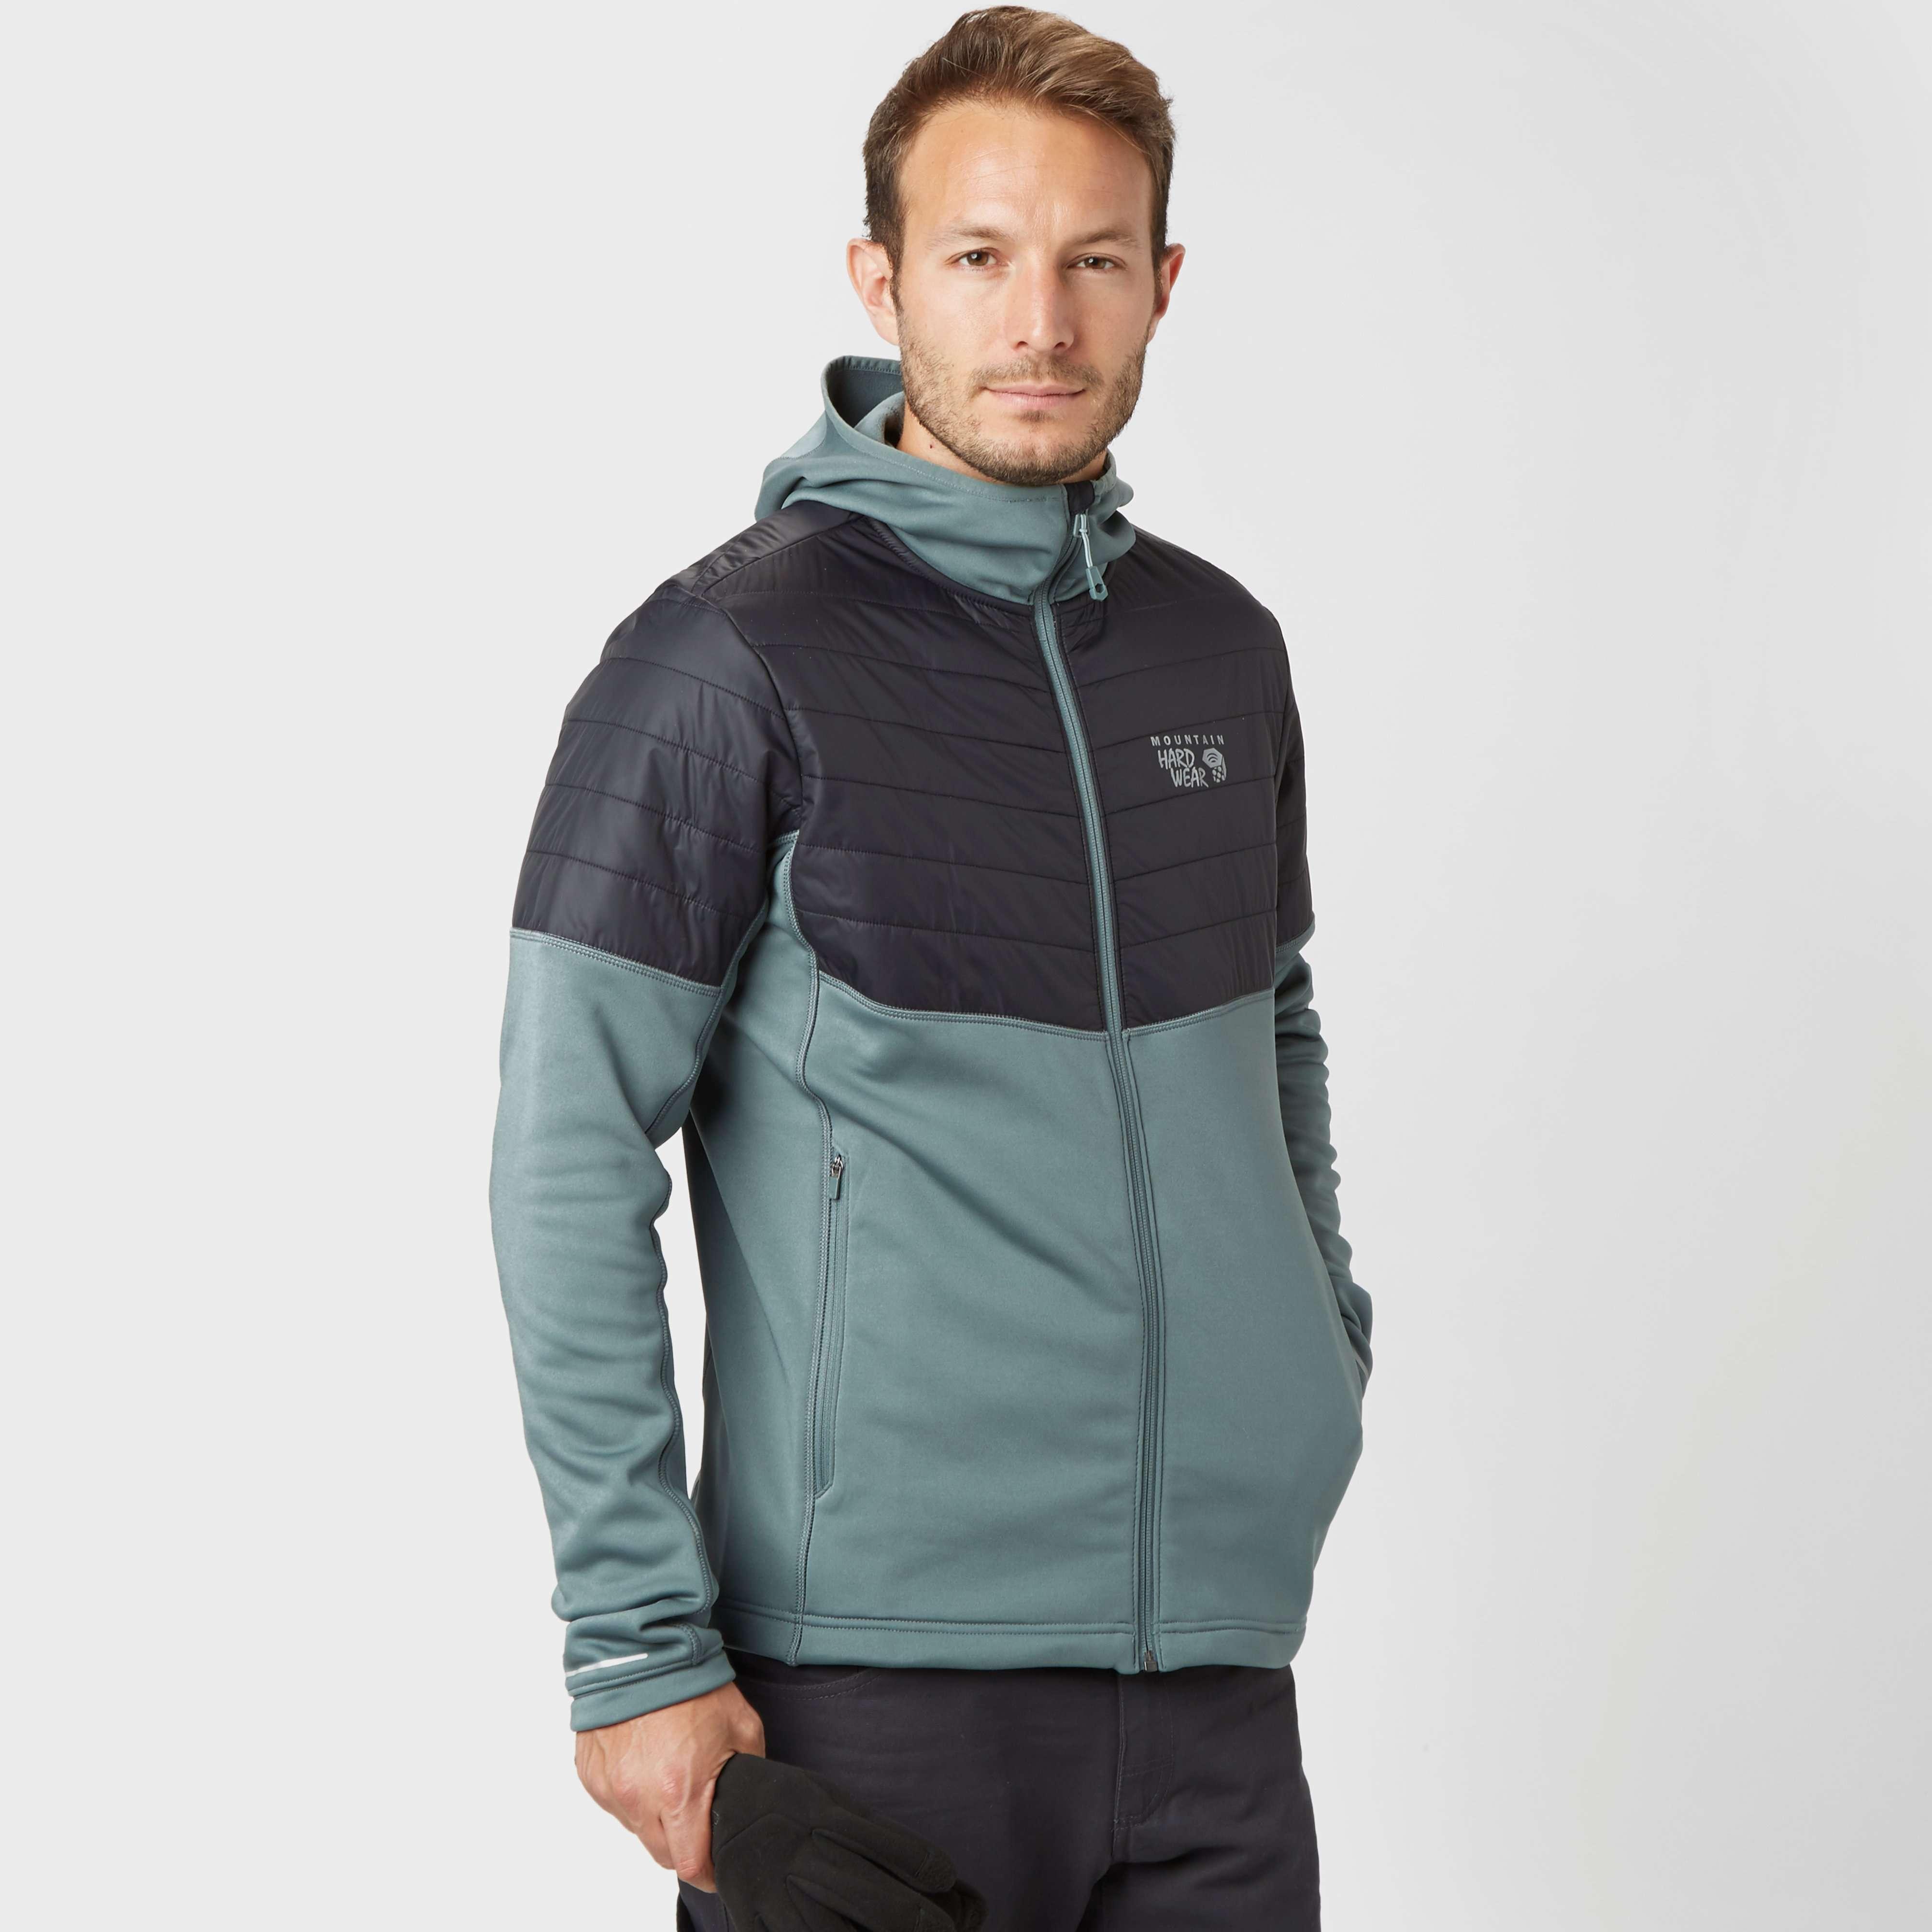 MOUNTAIN HARDWEAR Men's 32° Insulated Jacket